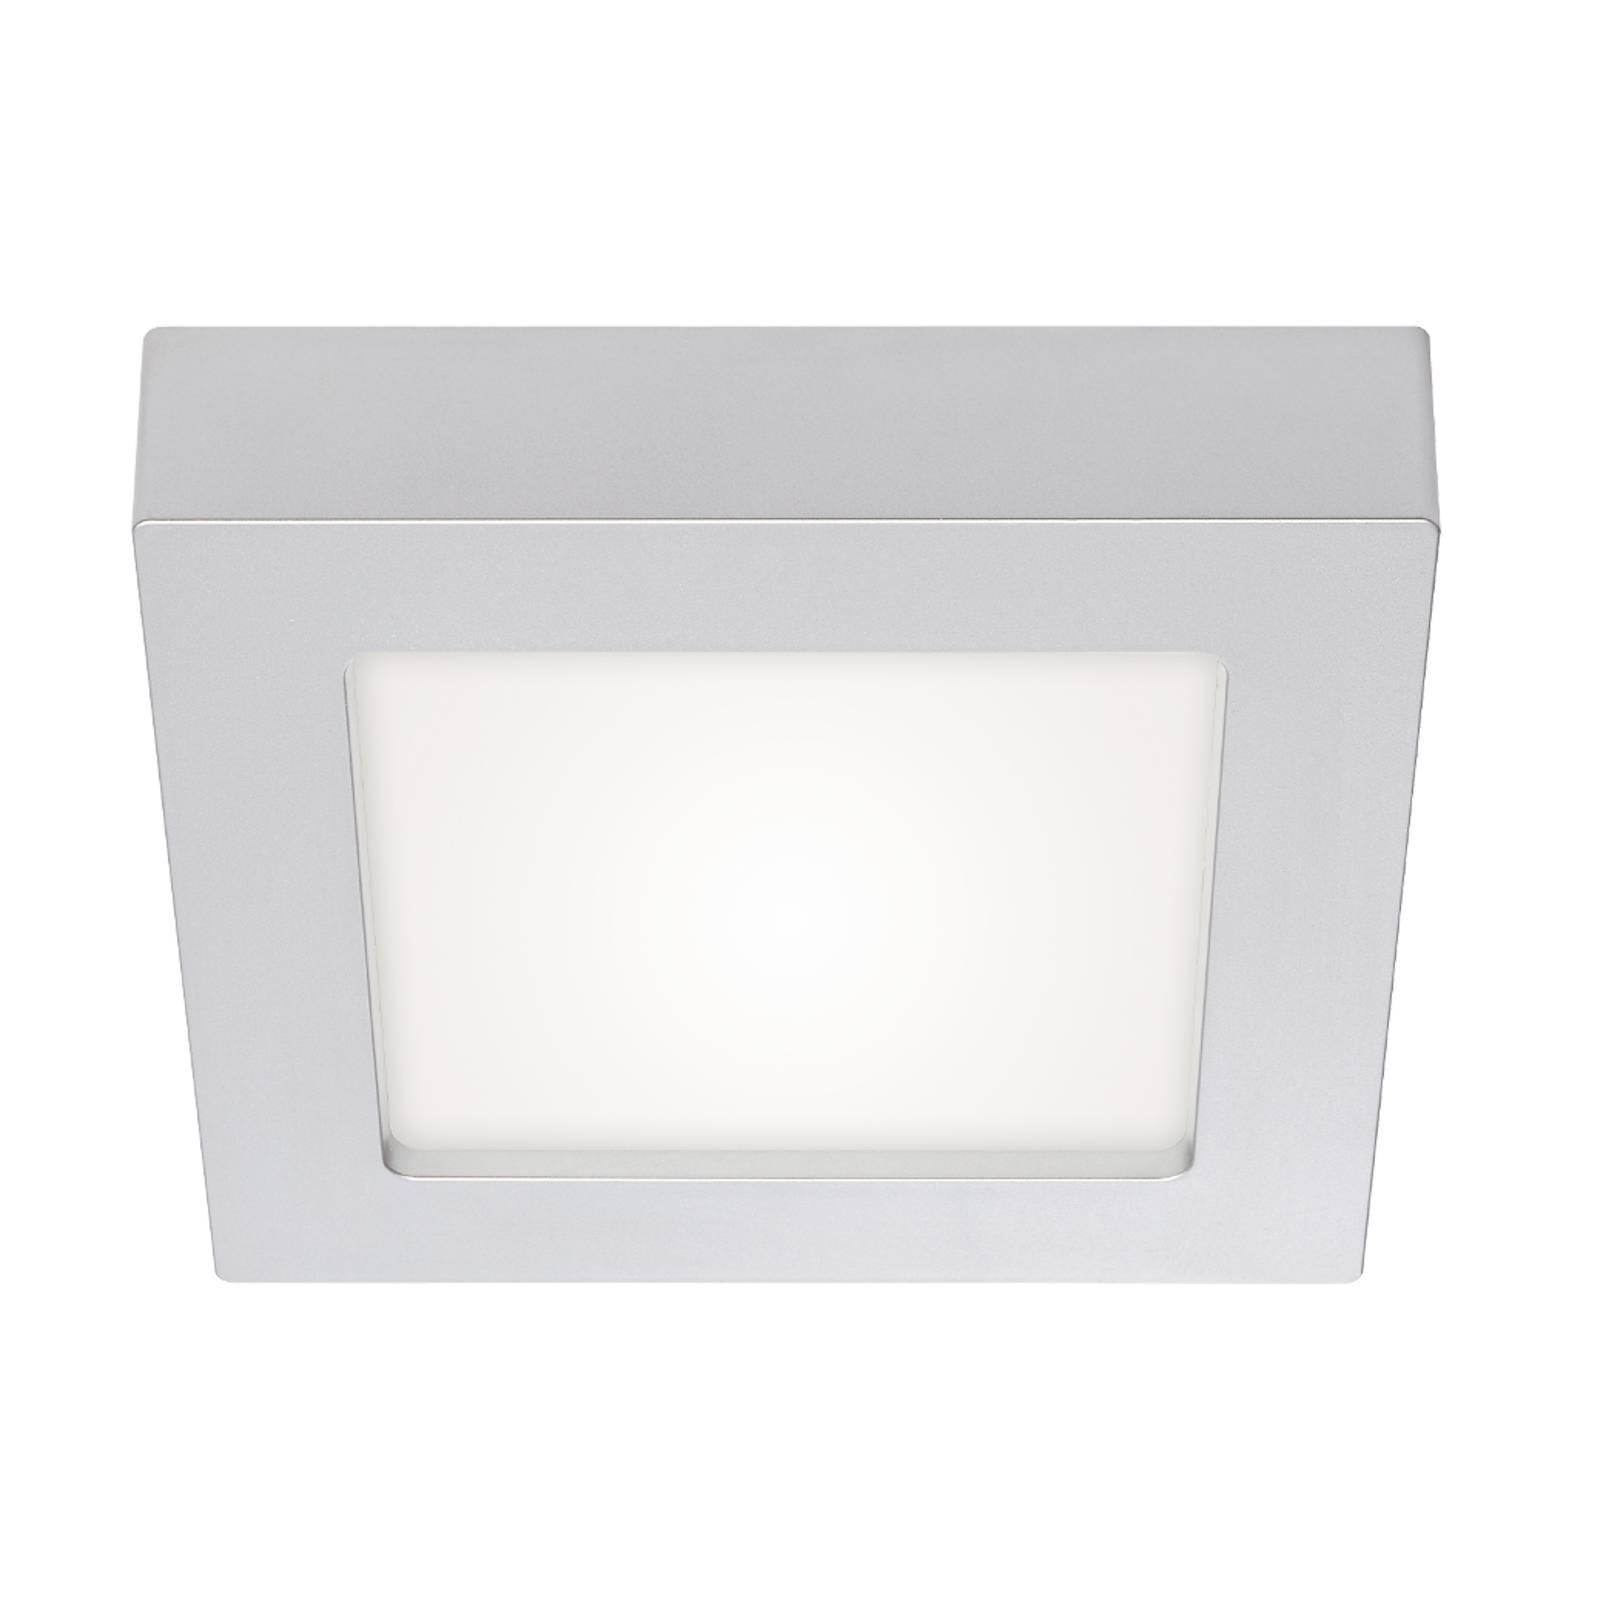 Prios Alette -LED-kattovalaisin hopea, 17,2 cm